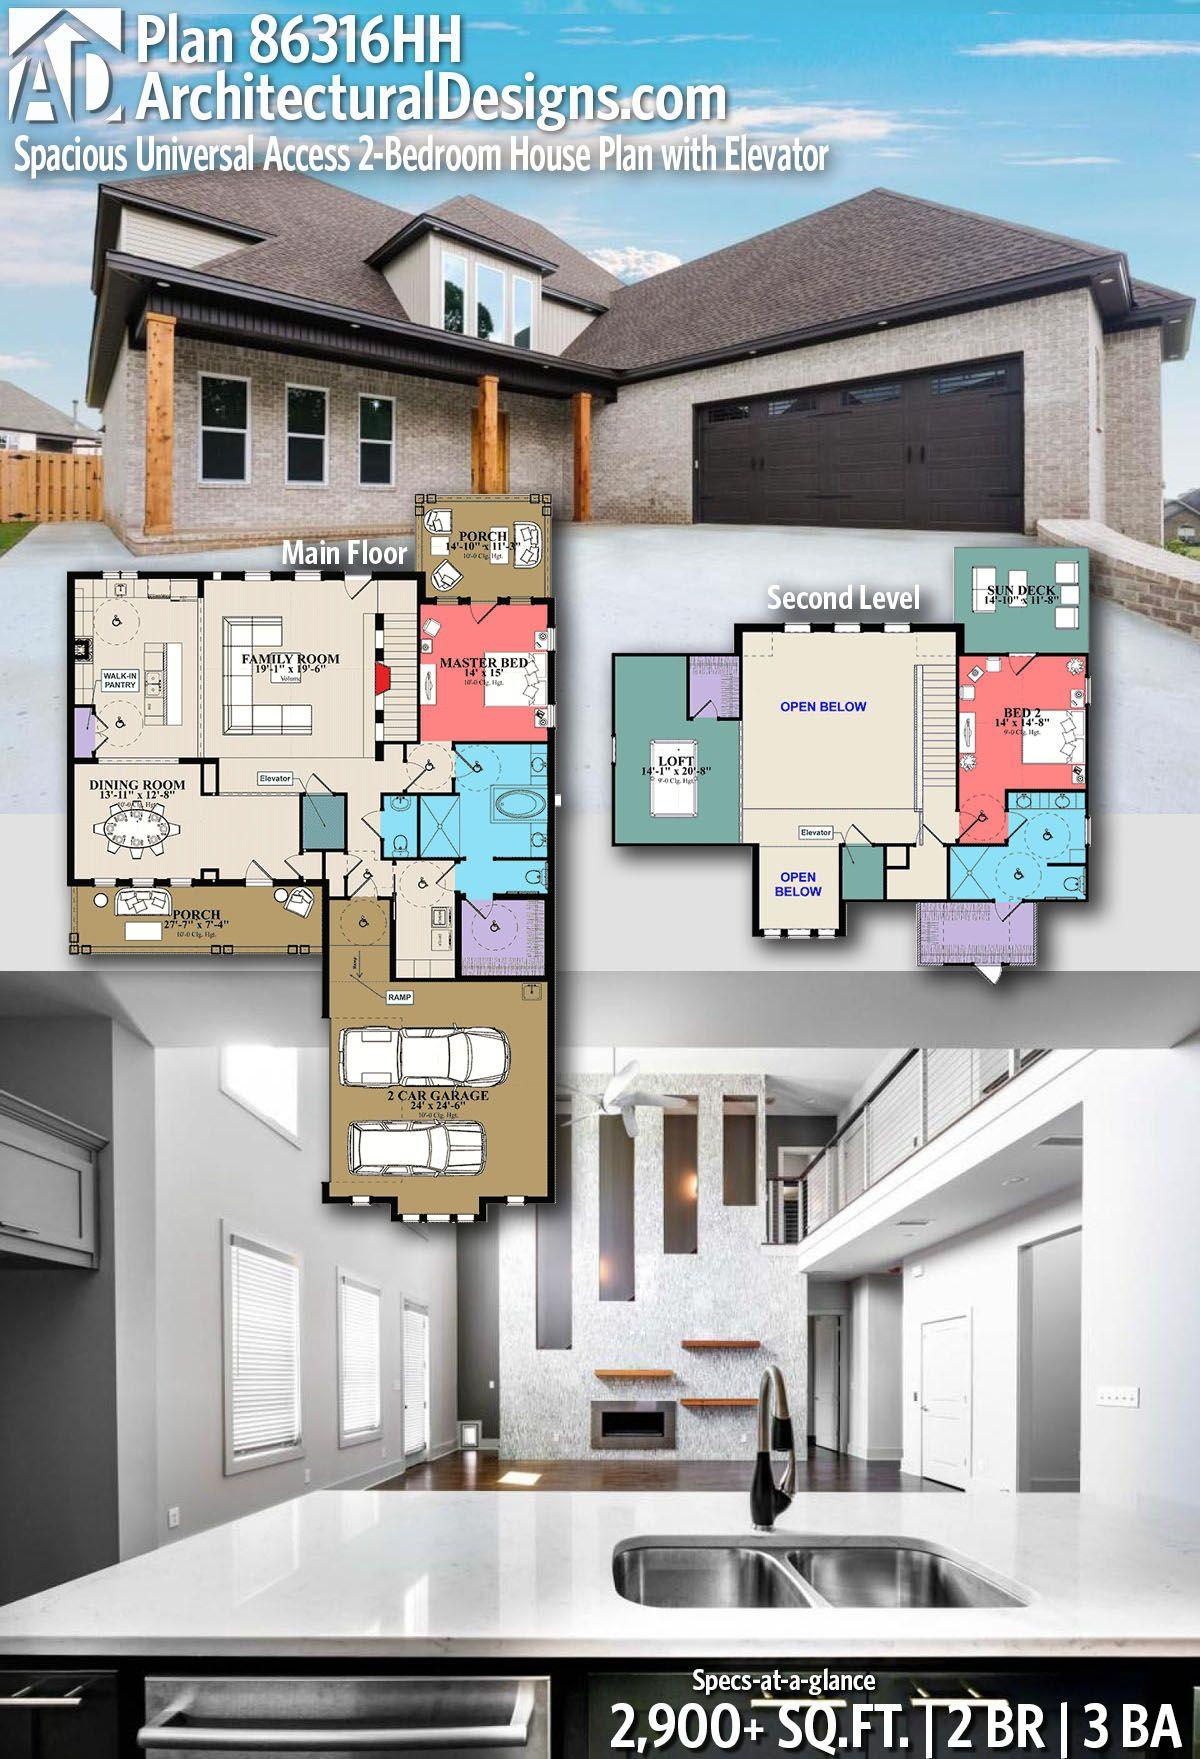 Plan 86316hh Spacious Universal Access 2 Bedroom House Plan With Elevator House Plans Bedroom House Plans Home Design Floor Plans